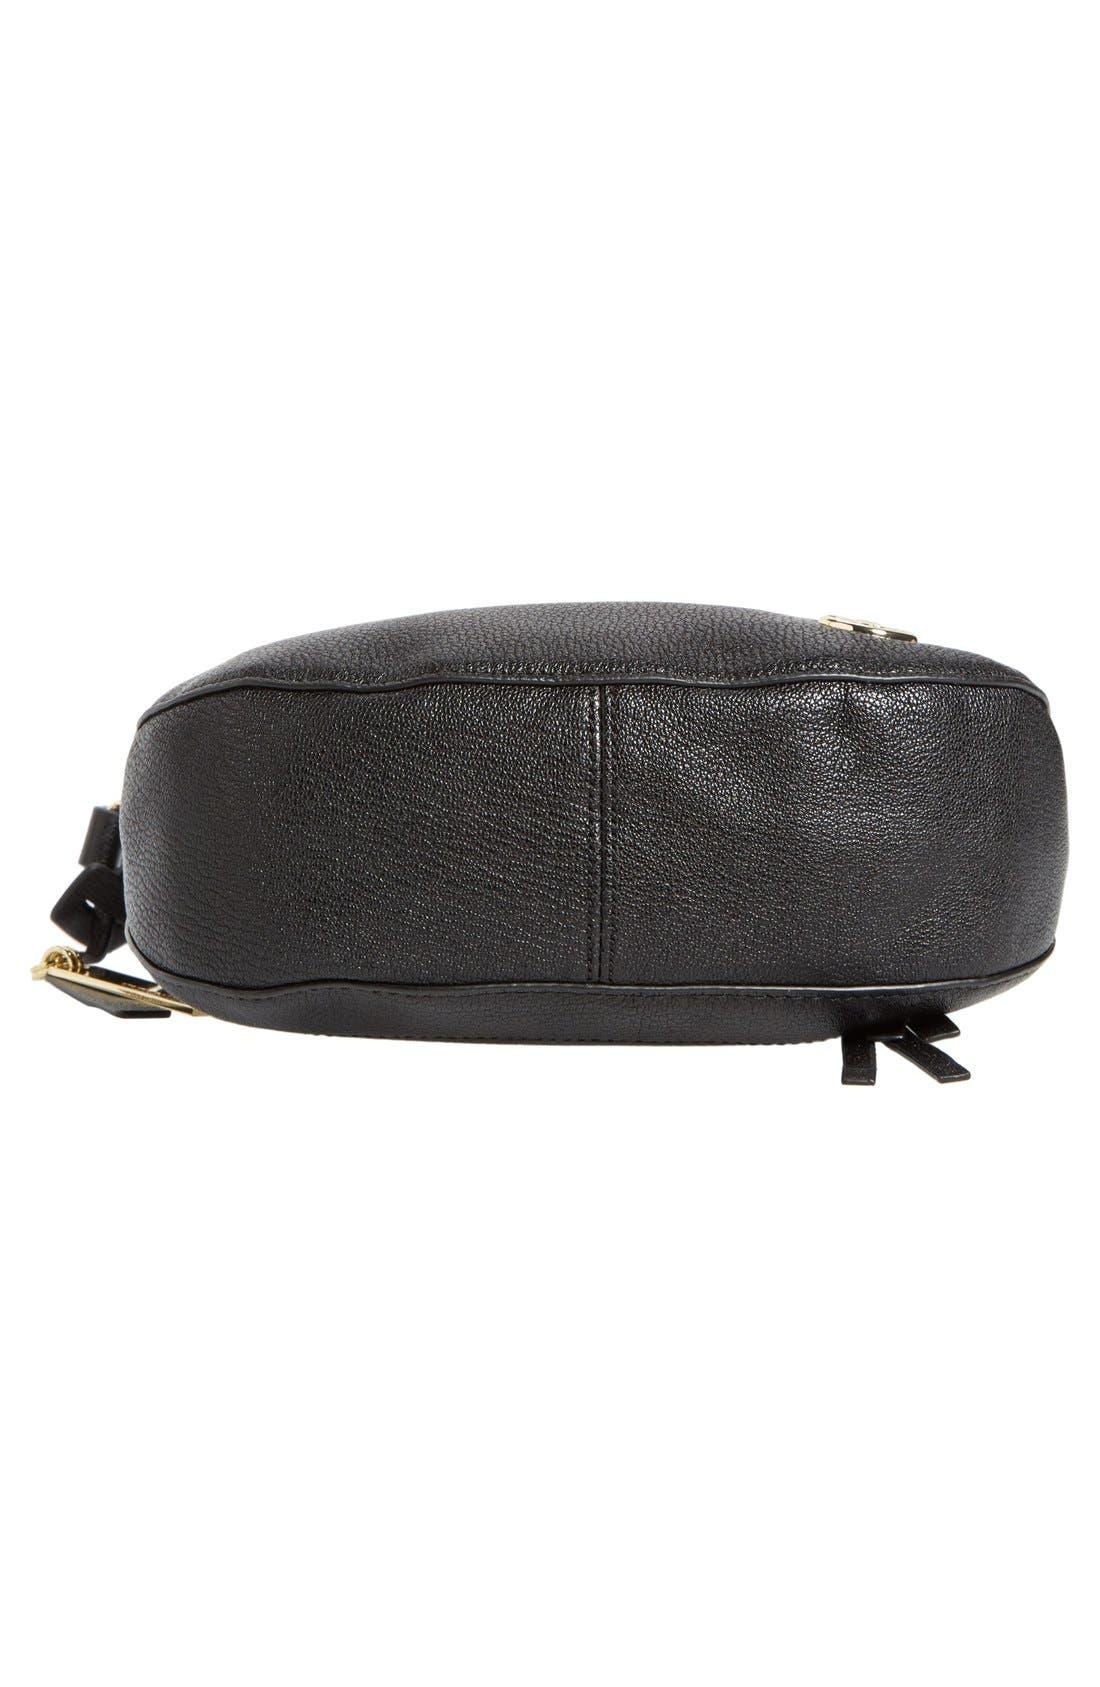 'Tala' Leather Crossbody Bag,                             Alternate thumbnail 4, color,                             001